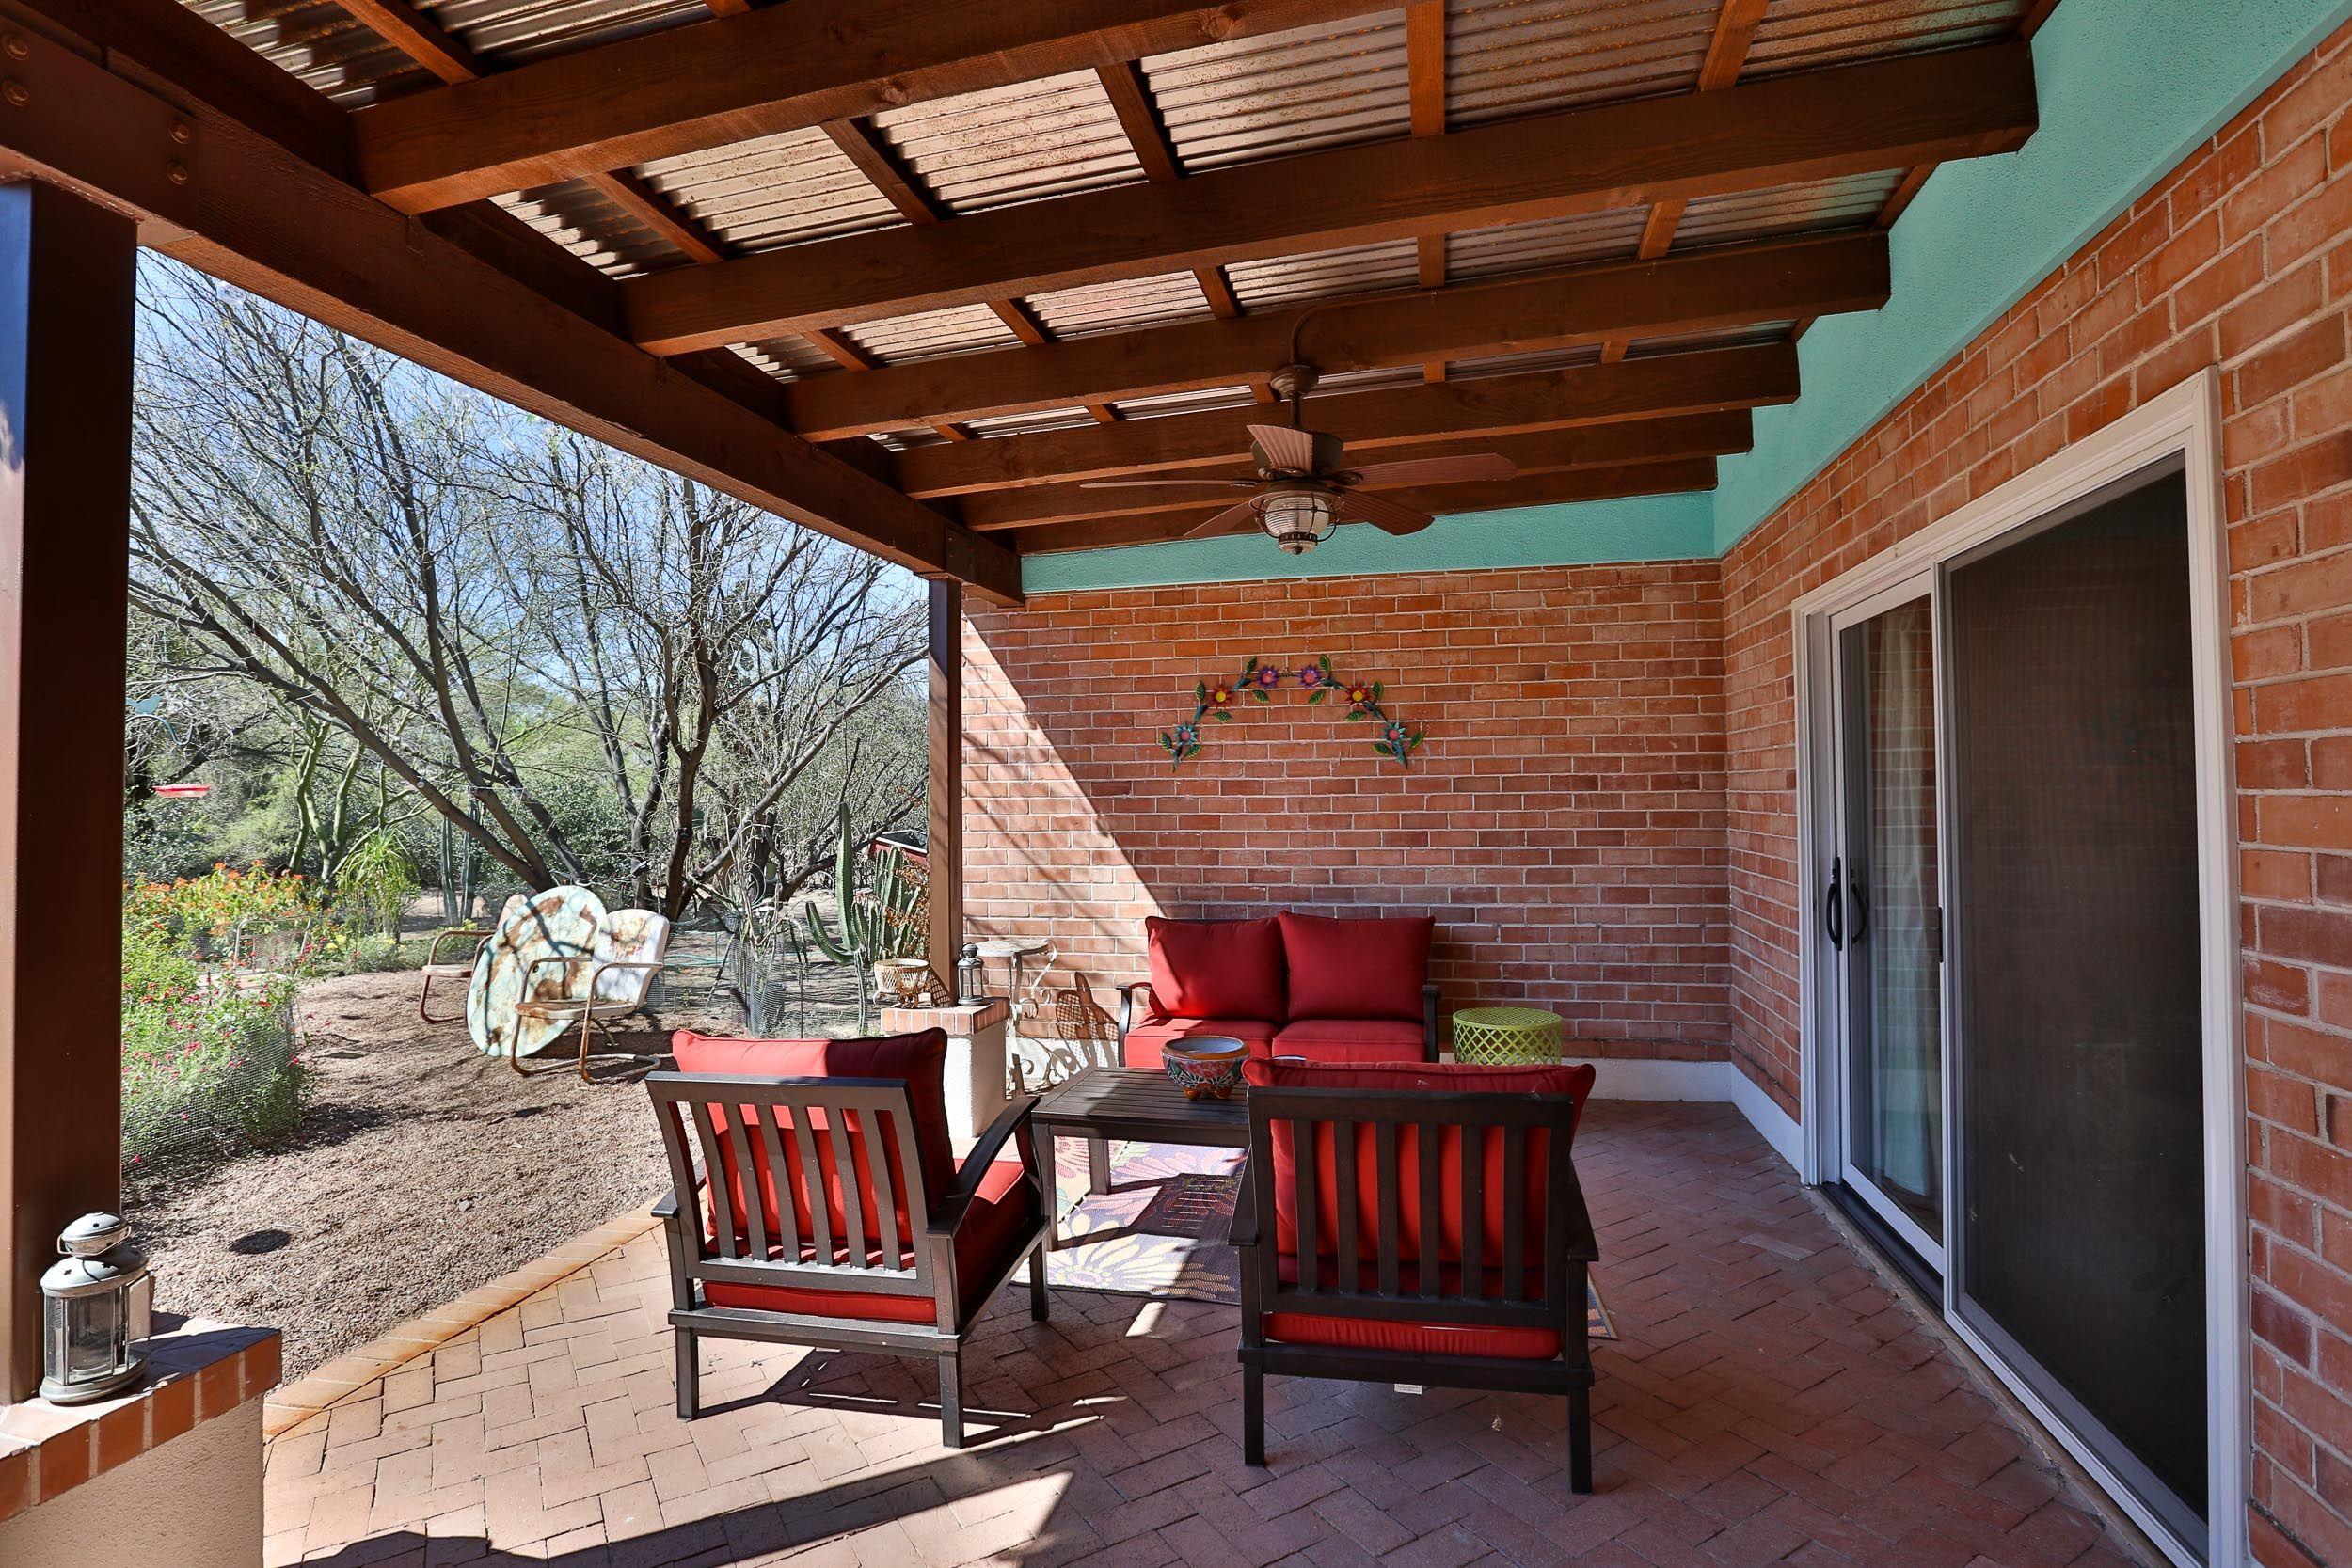 Tucson Arizona Architect Contractor Design Build Outdoor Patio